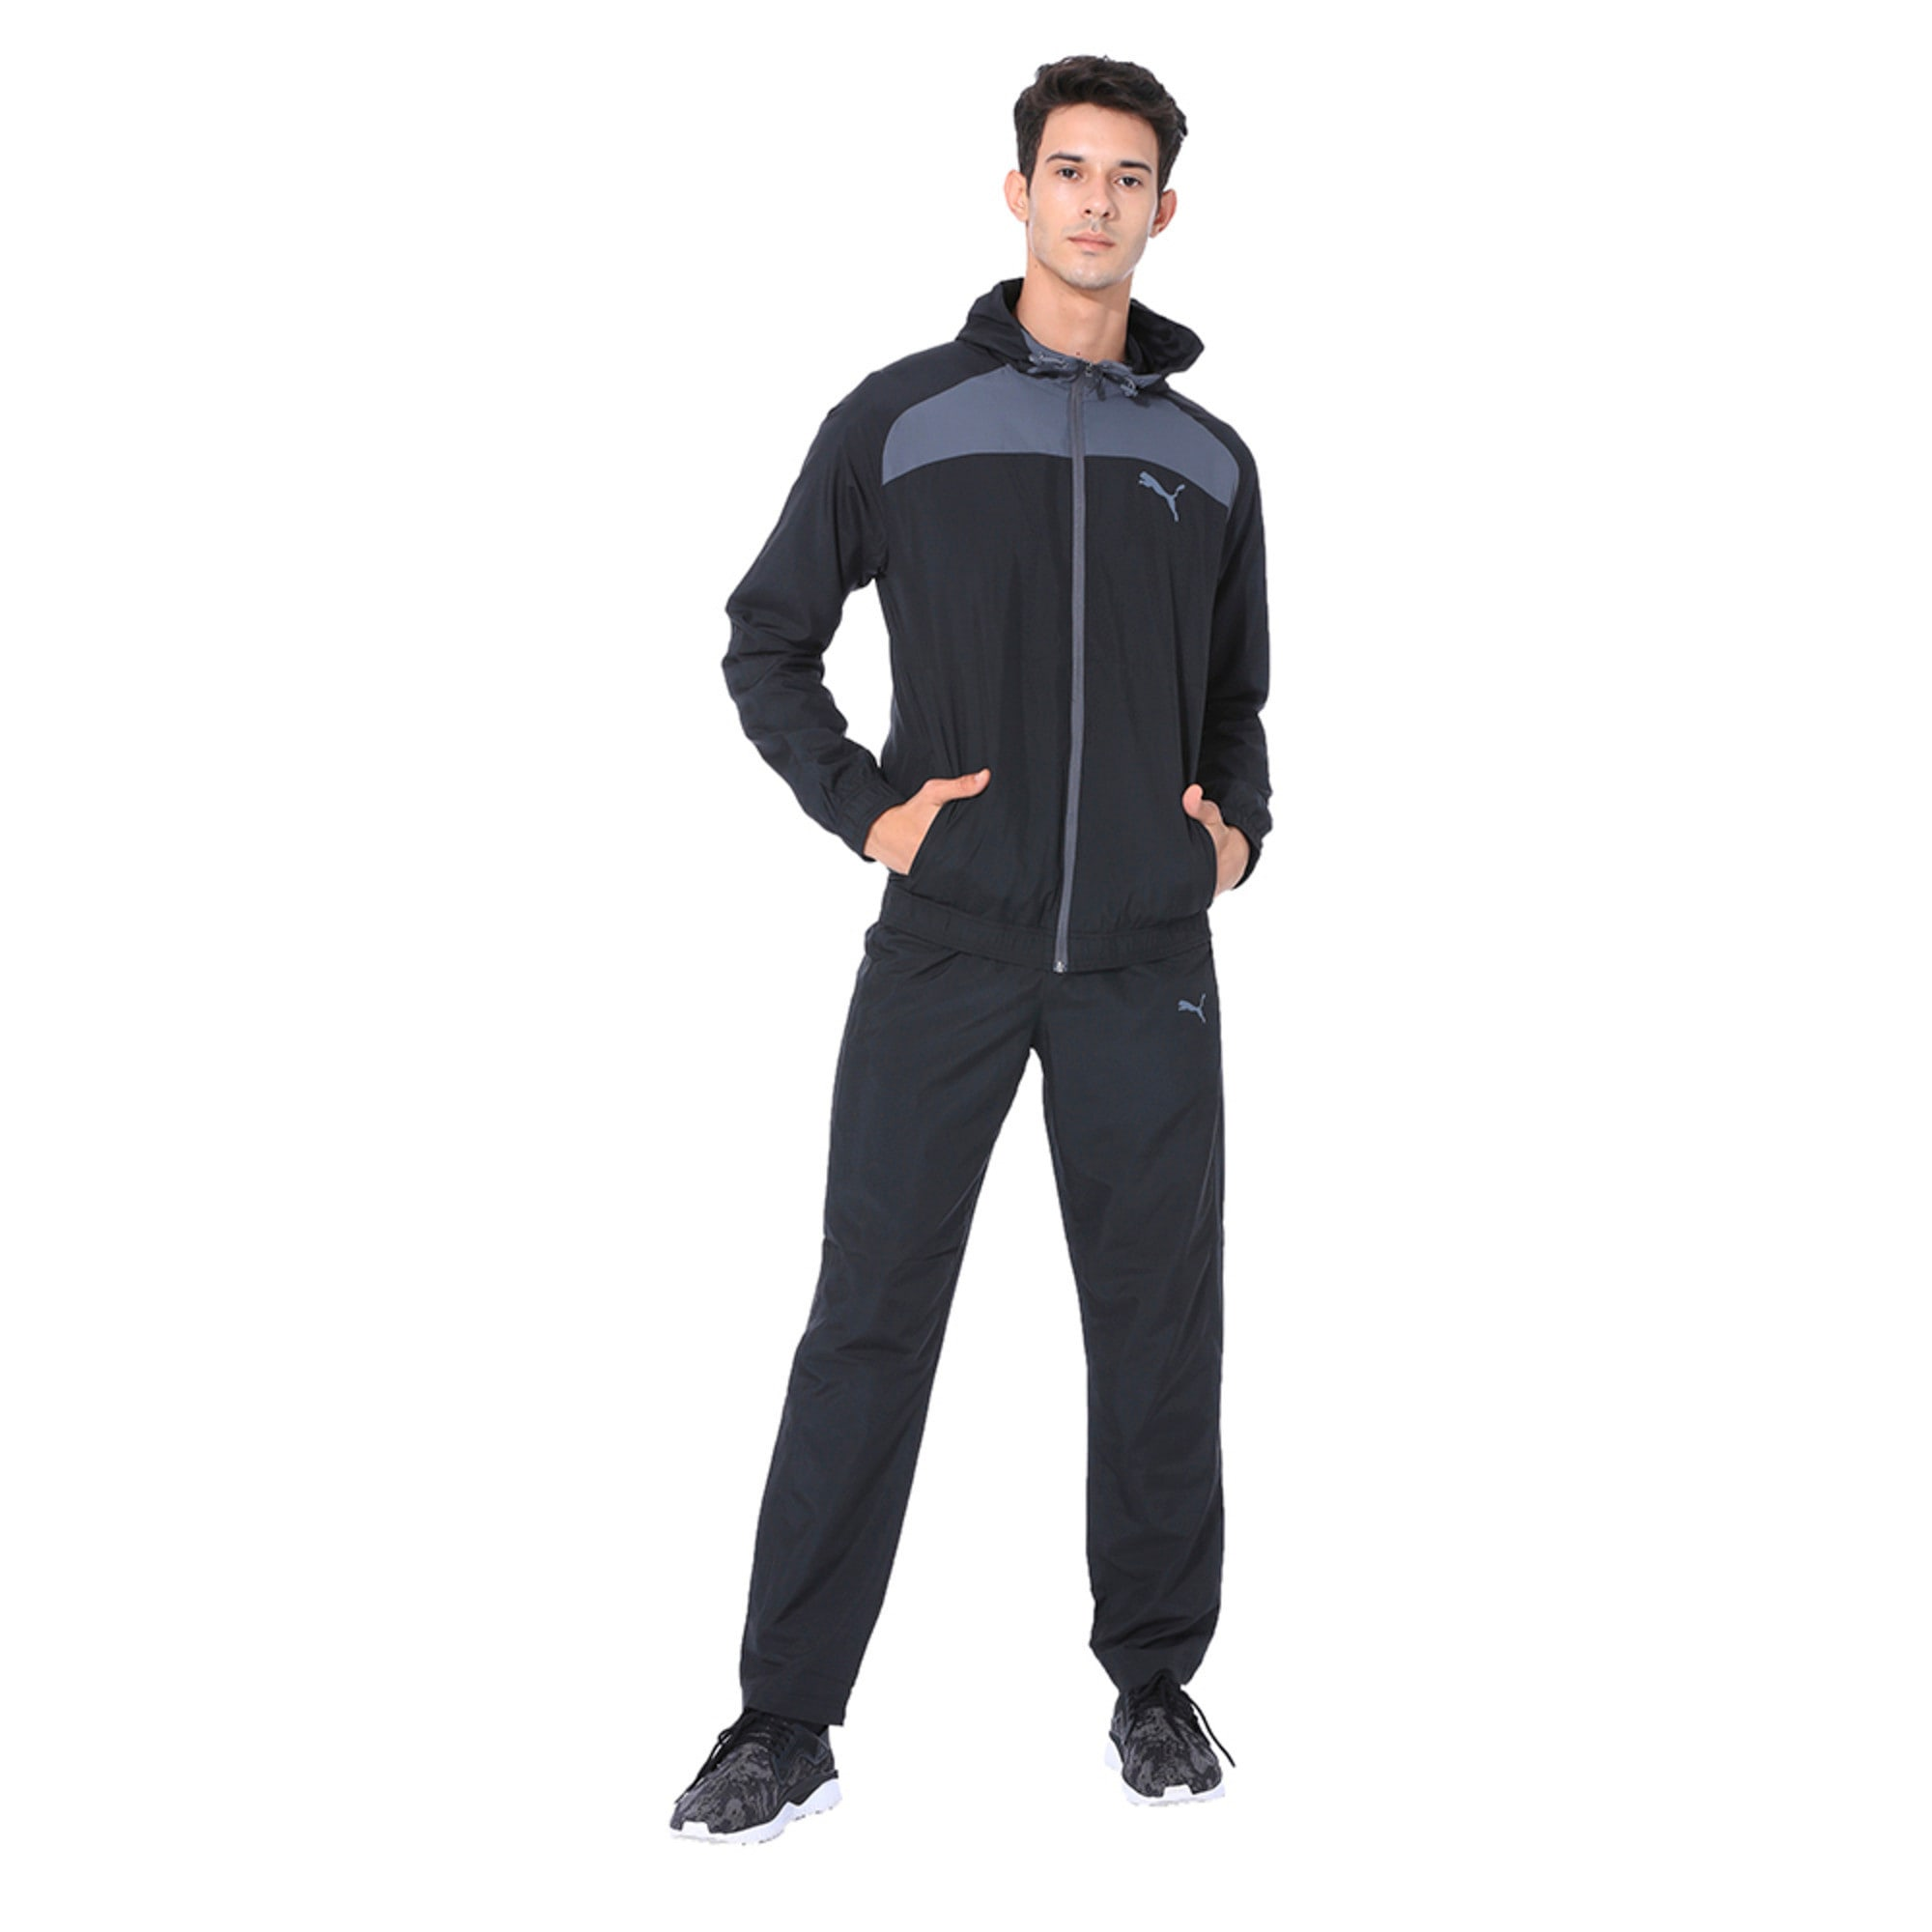 Thumbnail 4 of Modern Sport Hooded Suit Op. Peacoat-Pum, Puma Black-Iron Gate, medium-IND